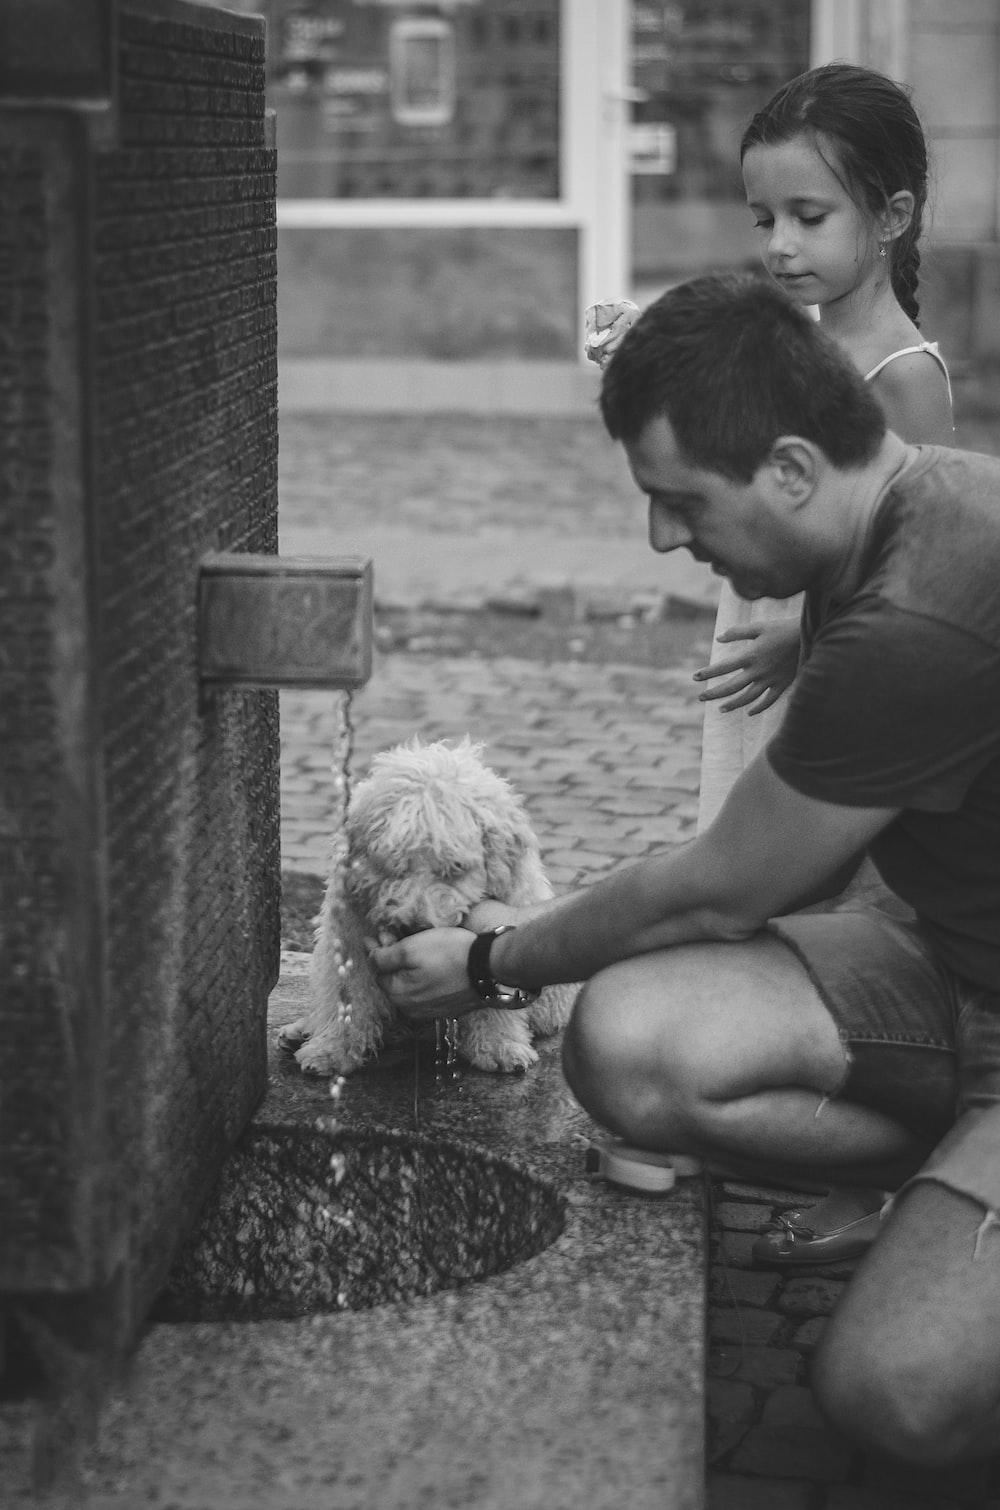 man kneeling beside girl feeding dog in grayscale photograpy